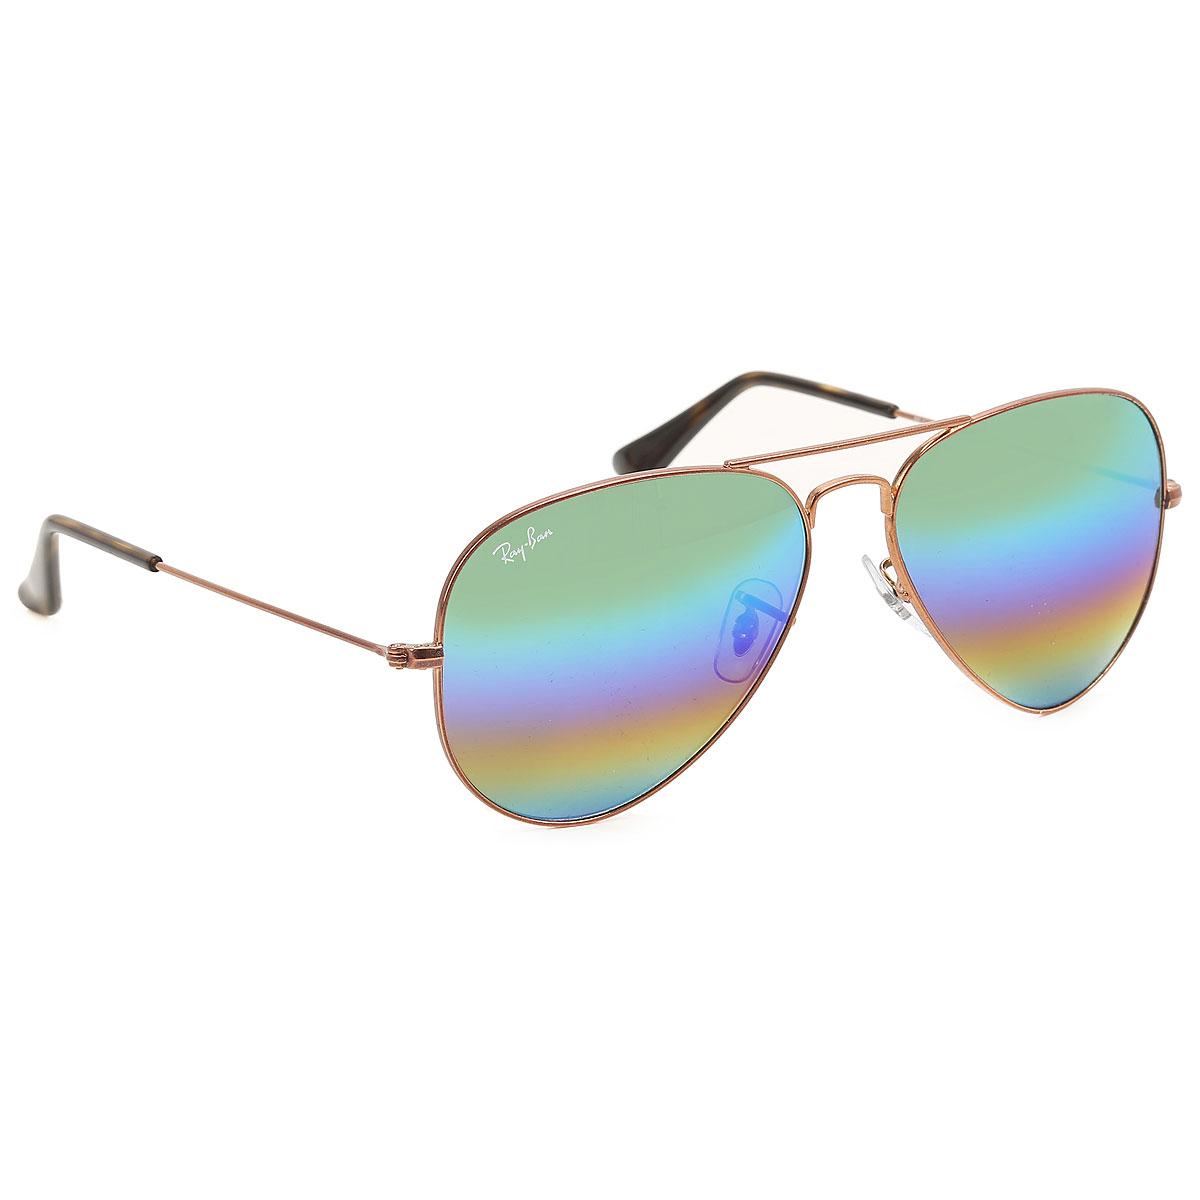 Ray Ban Sunglasses On Sale, Bronze, 2019